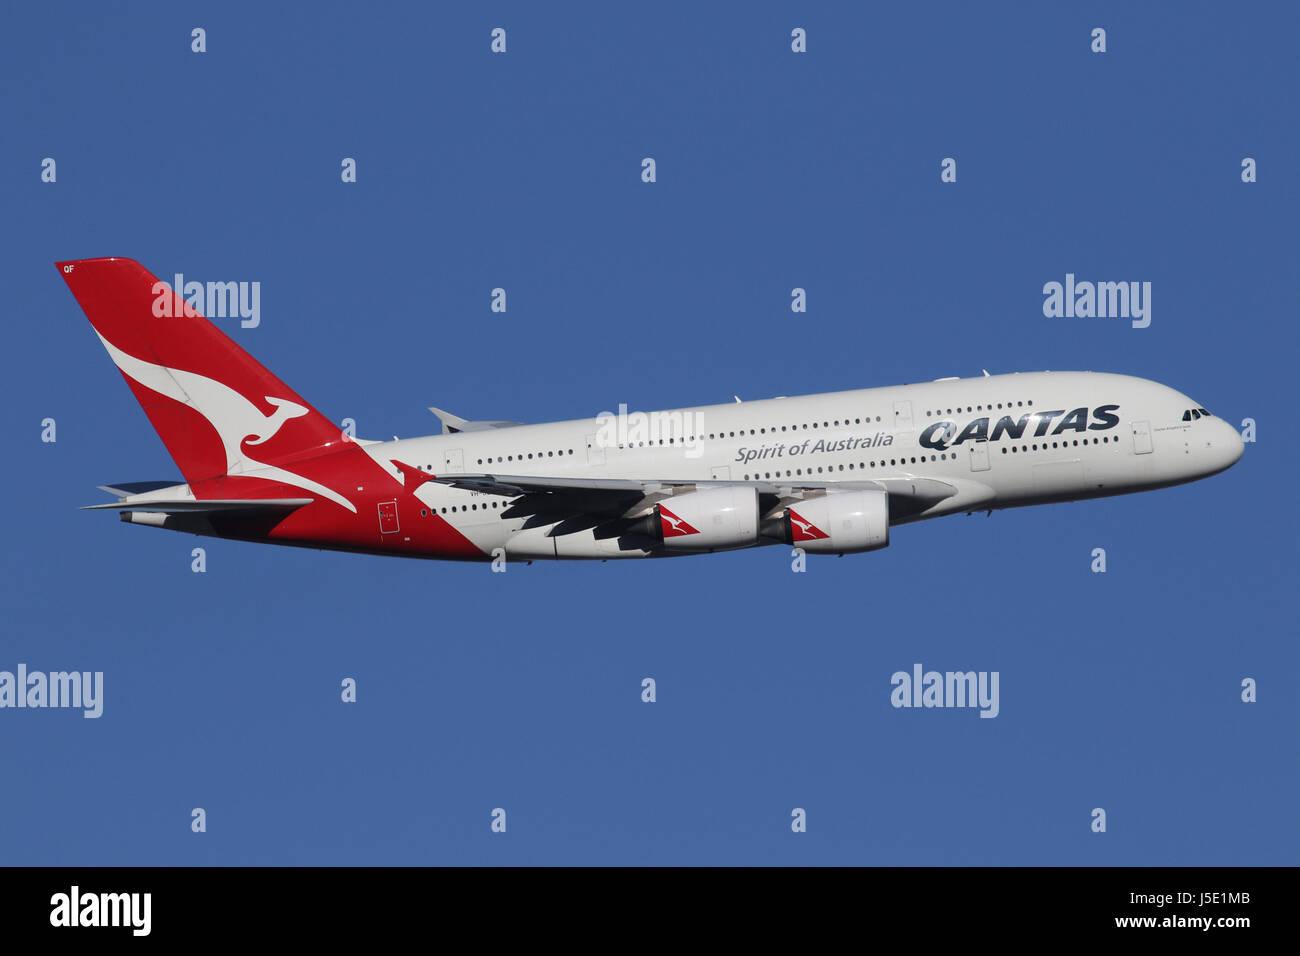 QANTAS A380 - Stock Image